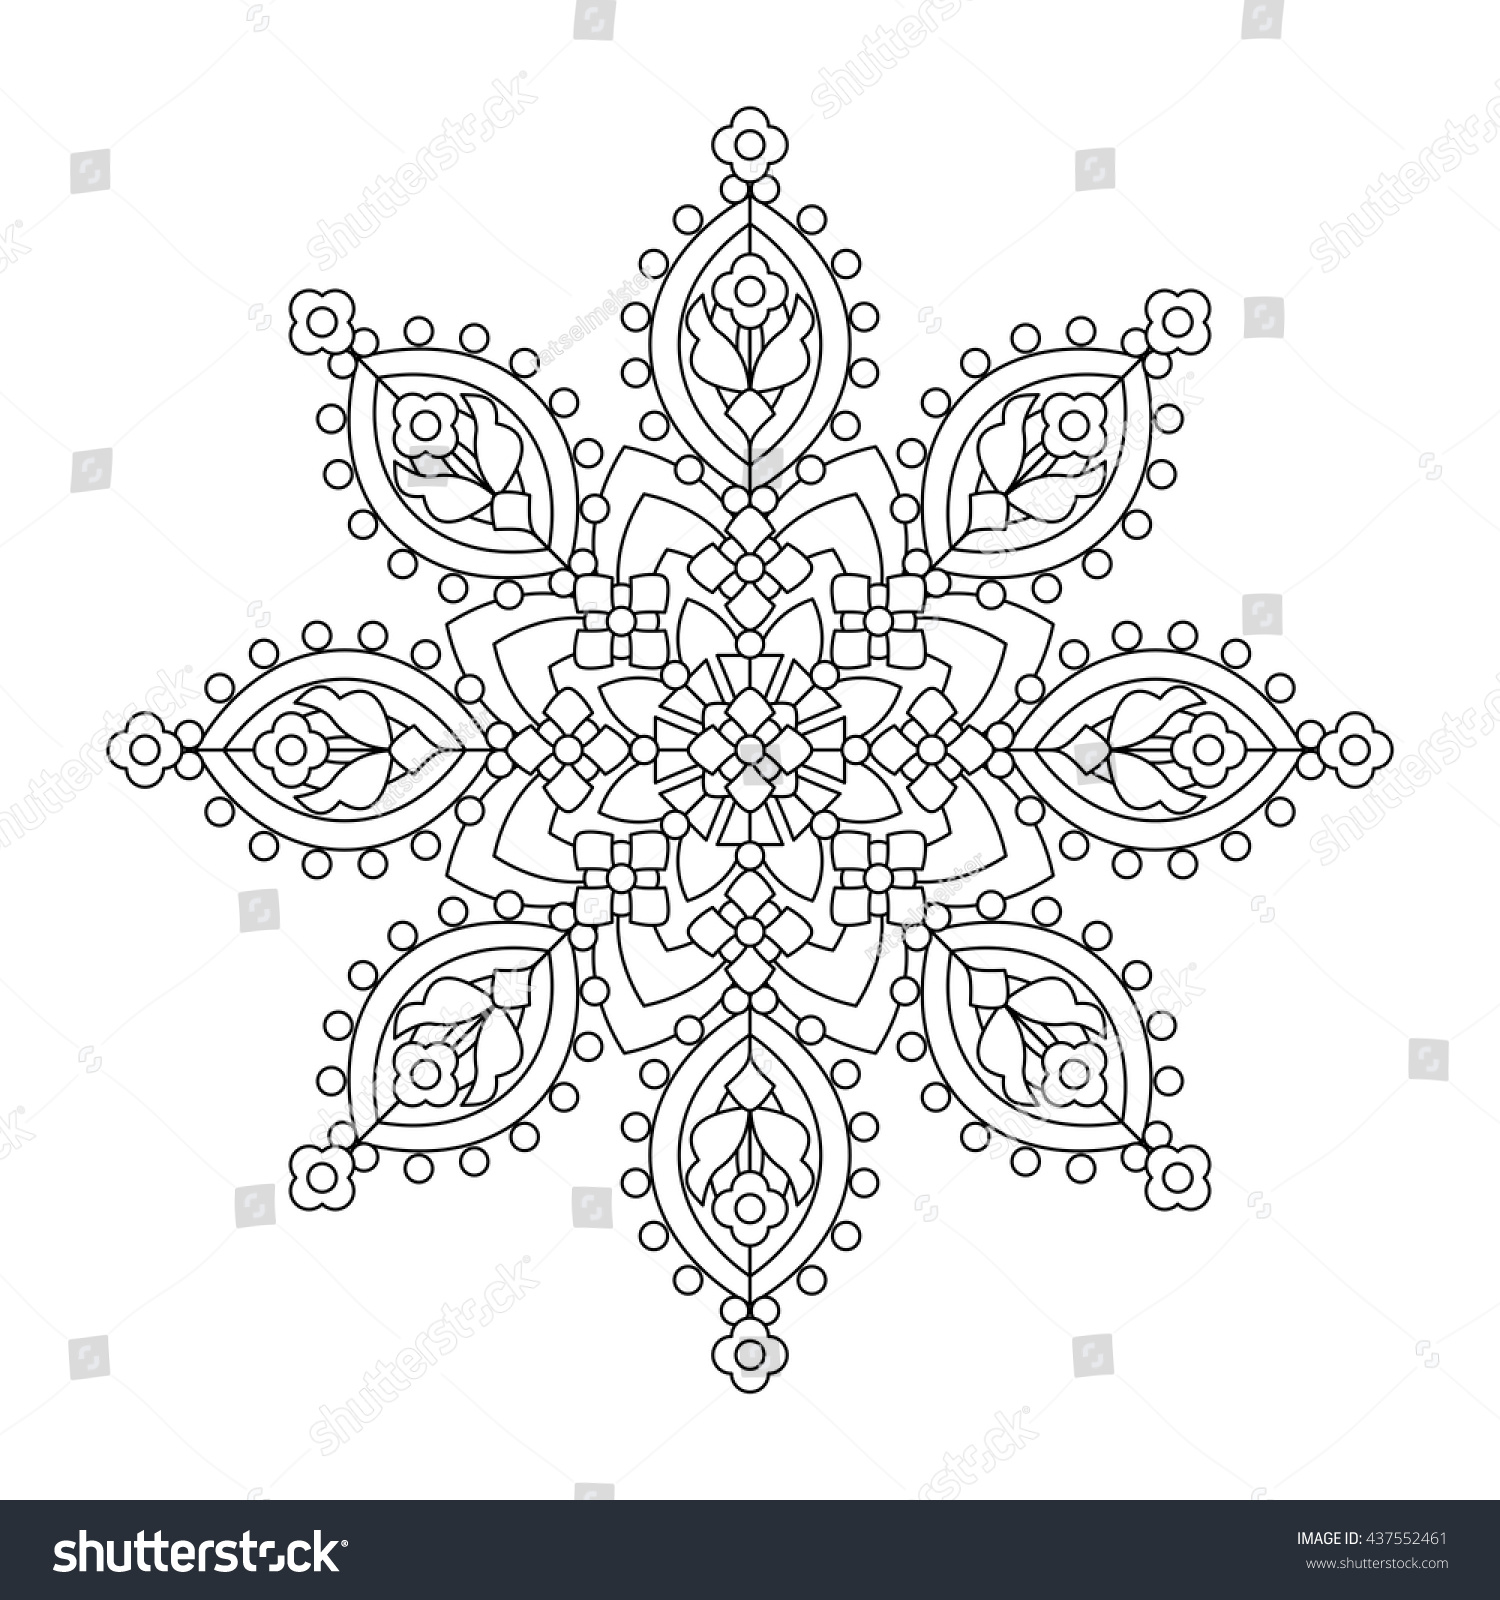 Abstract Mandala Whimsical Snowflake Line Art Stock Vector (Royalty ...